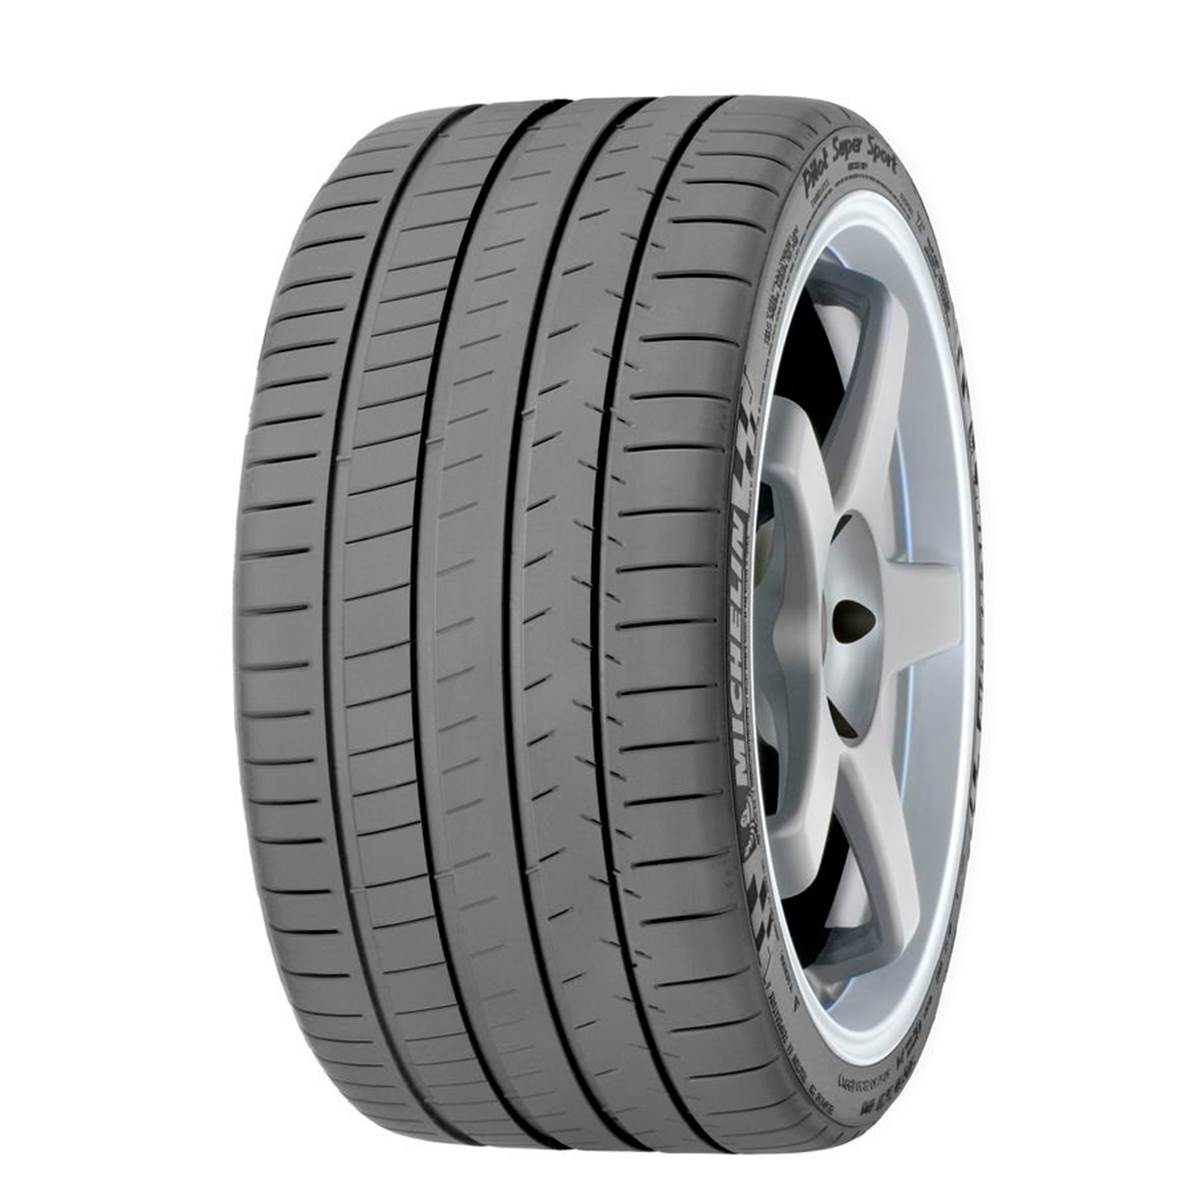 Pneu Michelin 245/30R21 91Y Pilot Super Sport XL